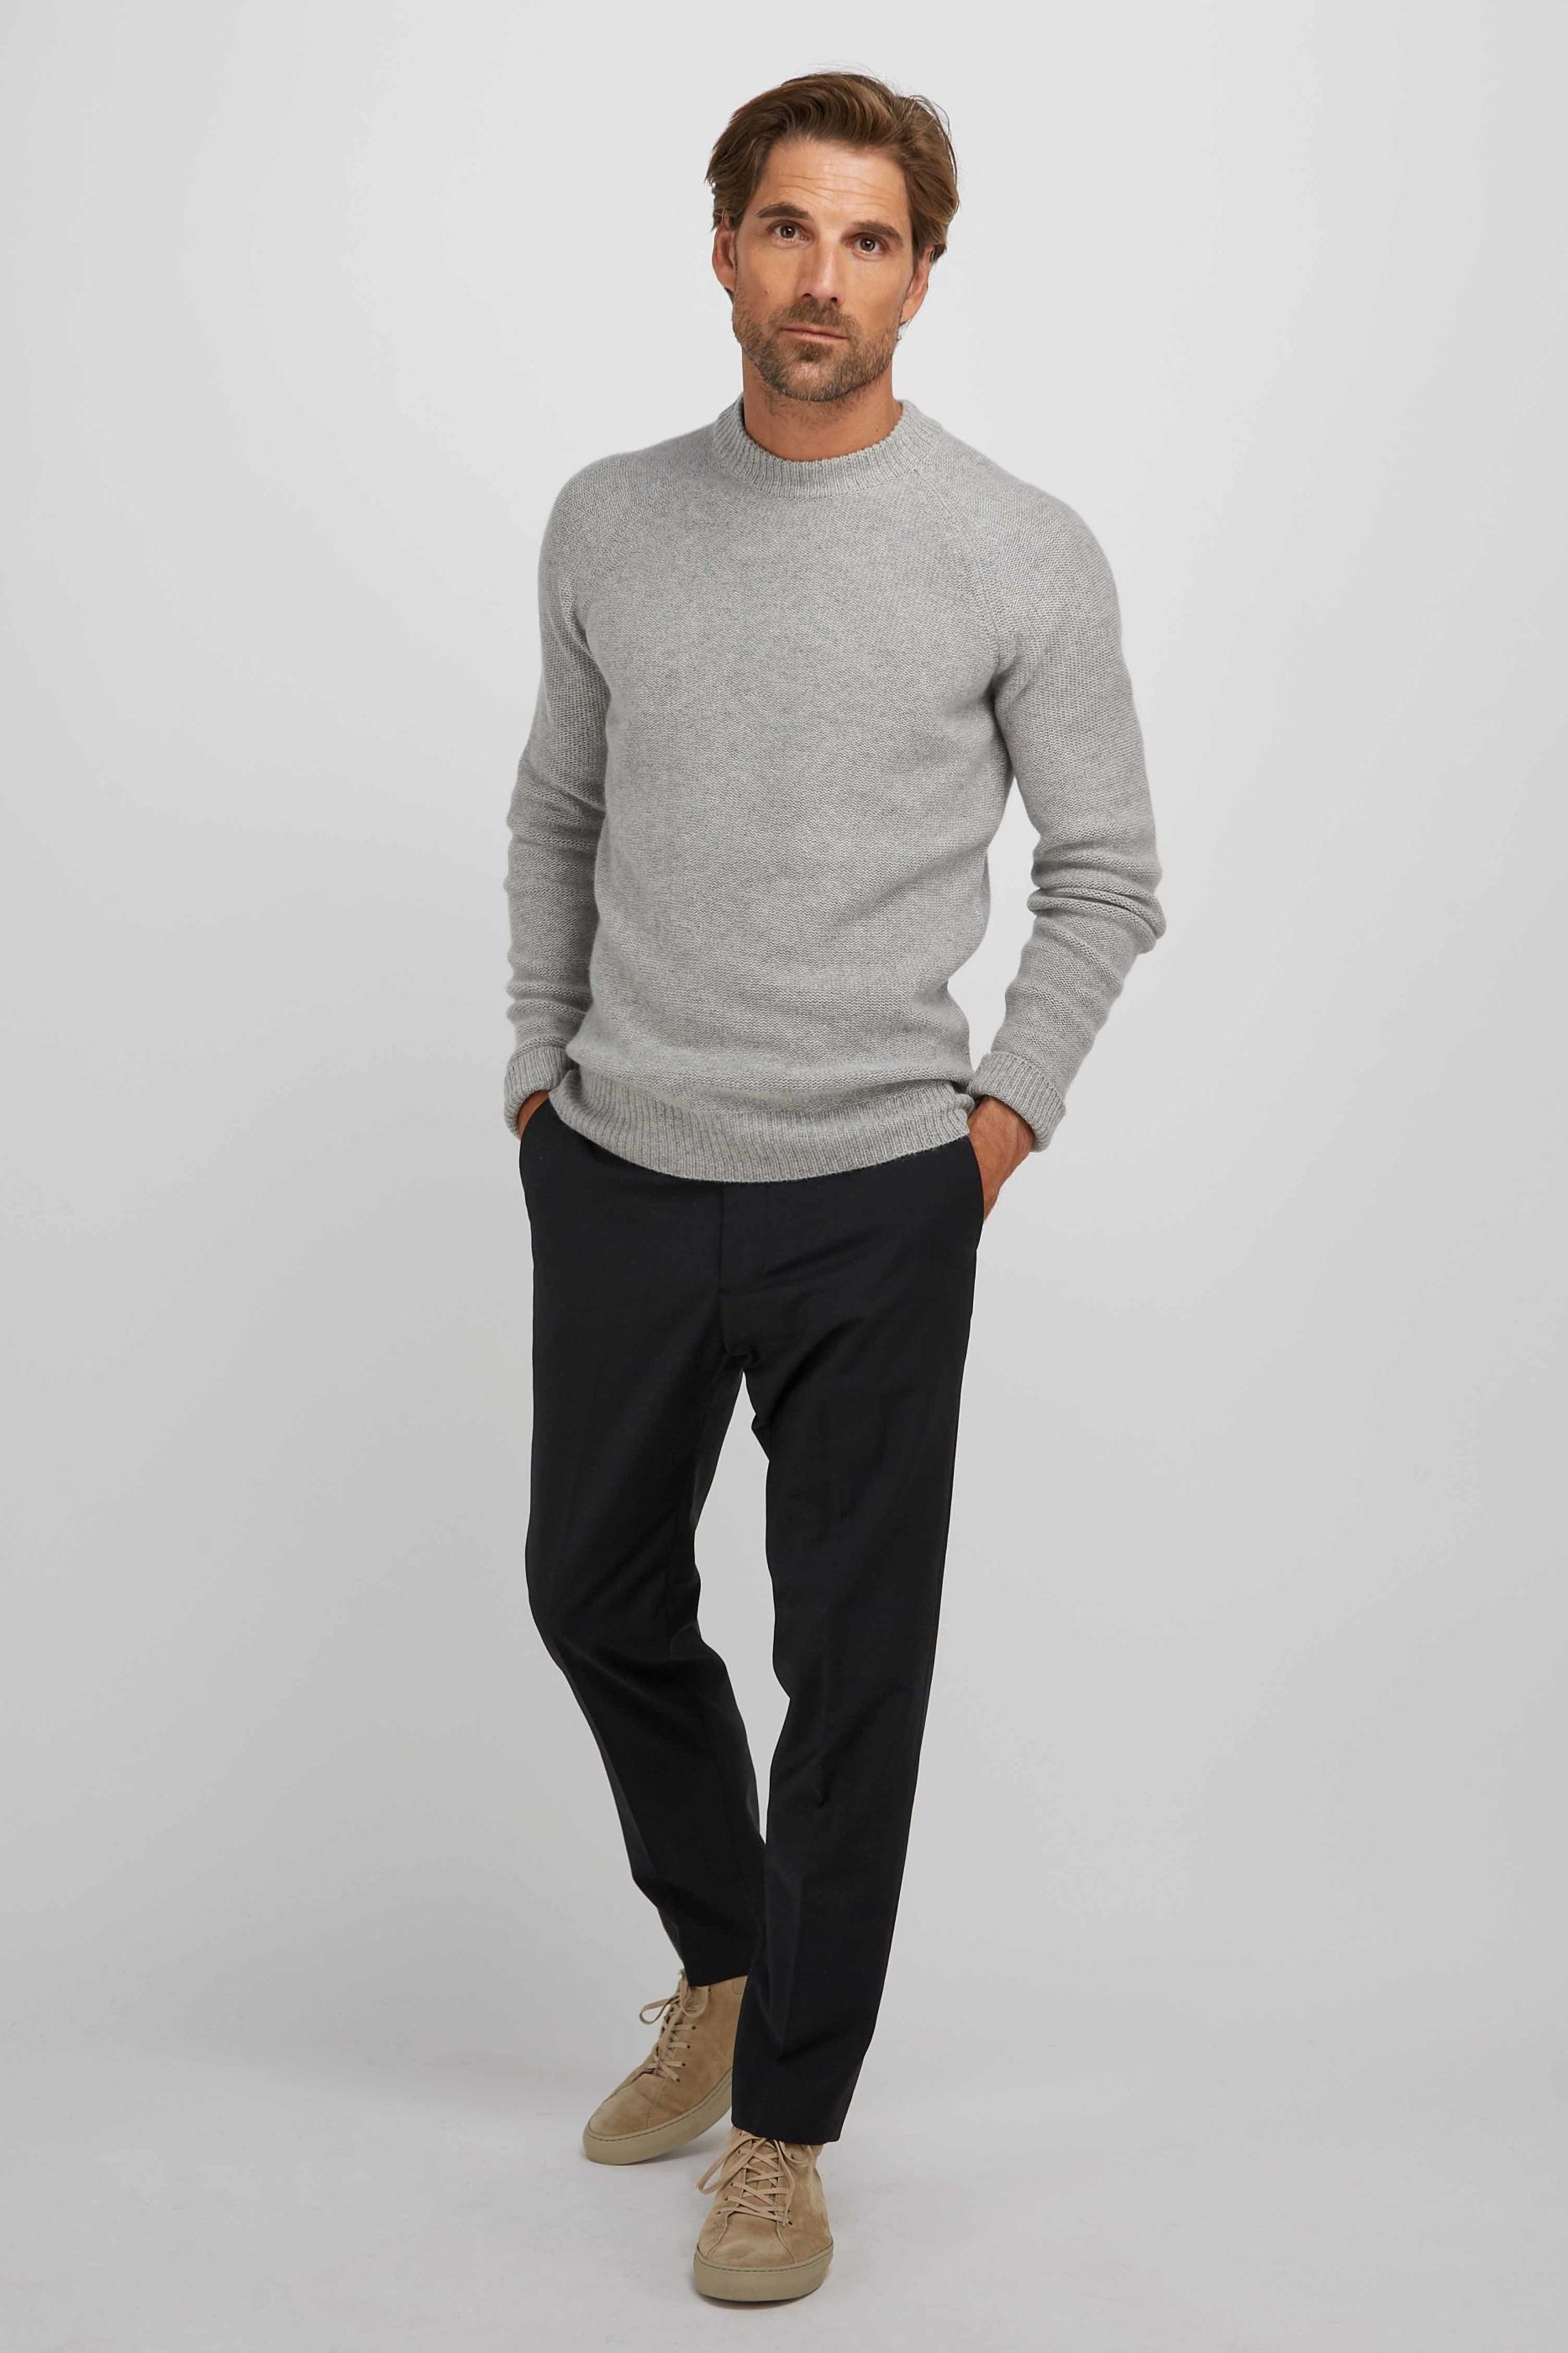 ManRaglanBoxSweater_LightGrey_2